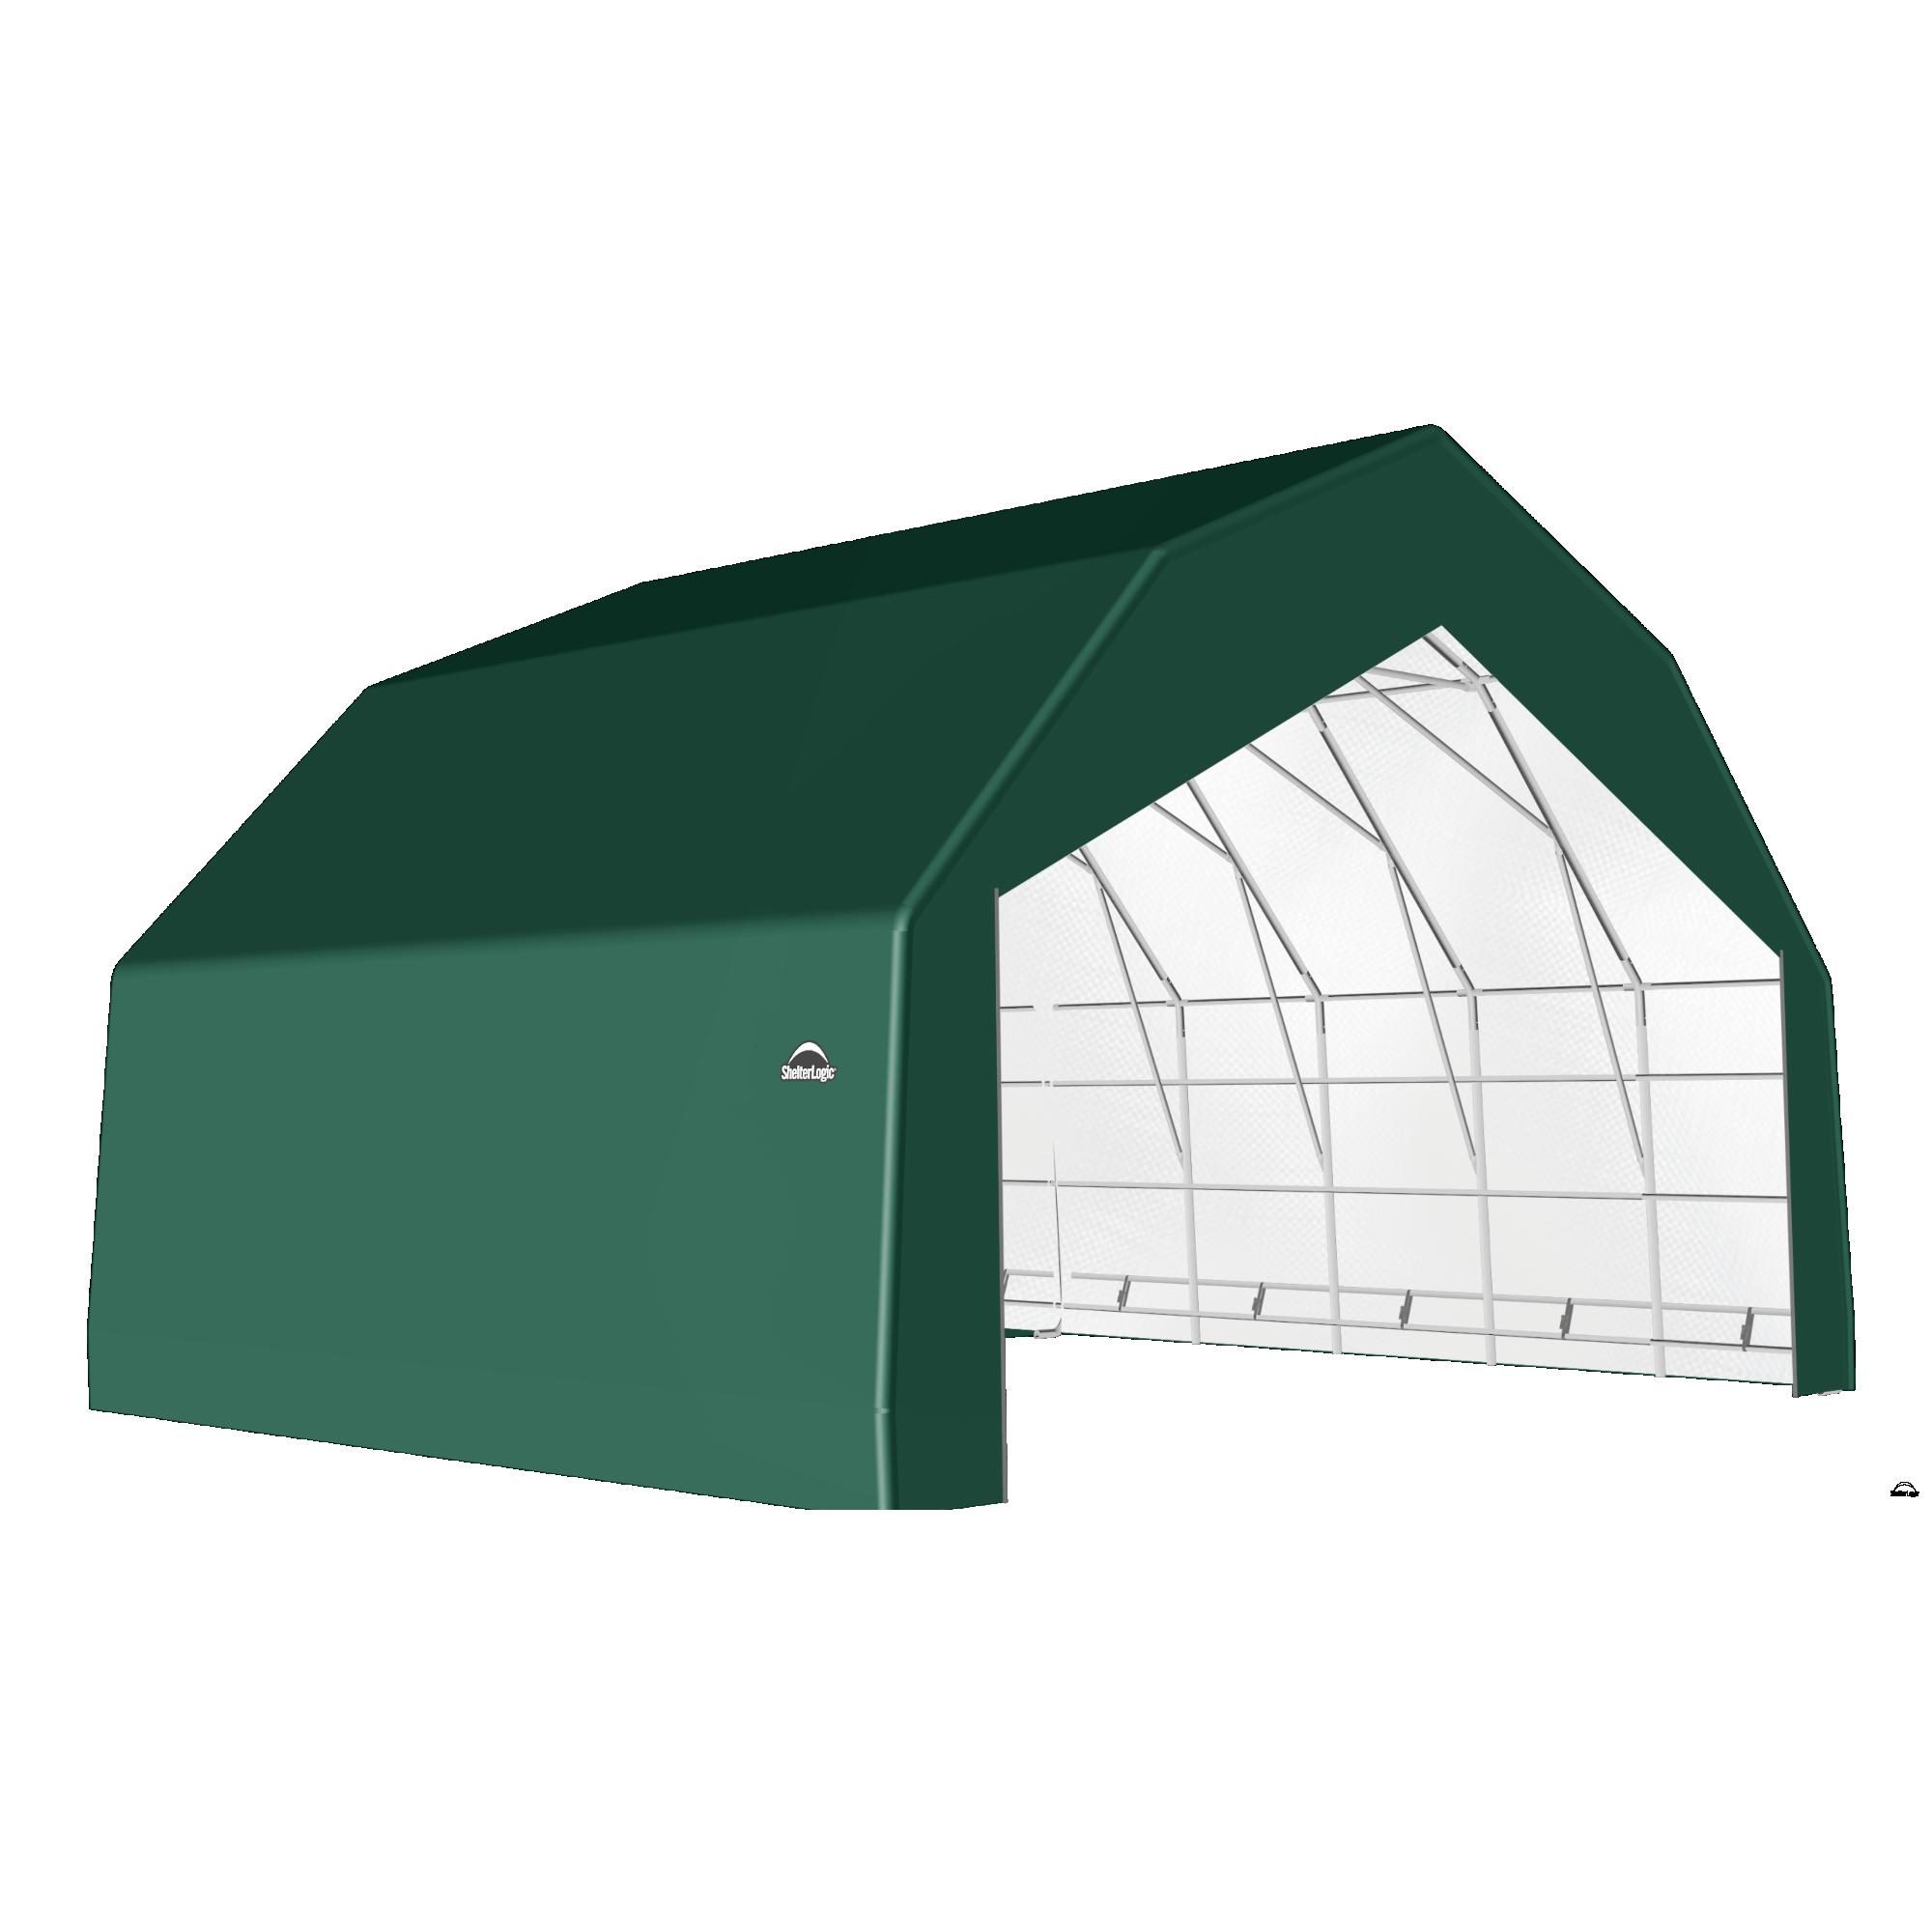 SP Barn 30X28X18 Green 14 oz PE Shelter